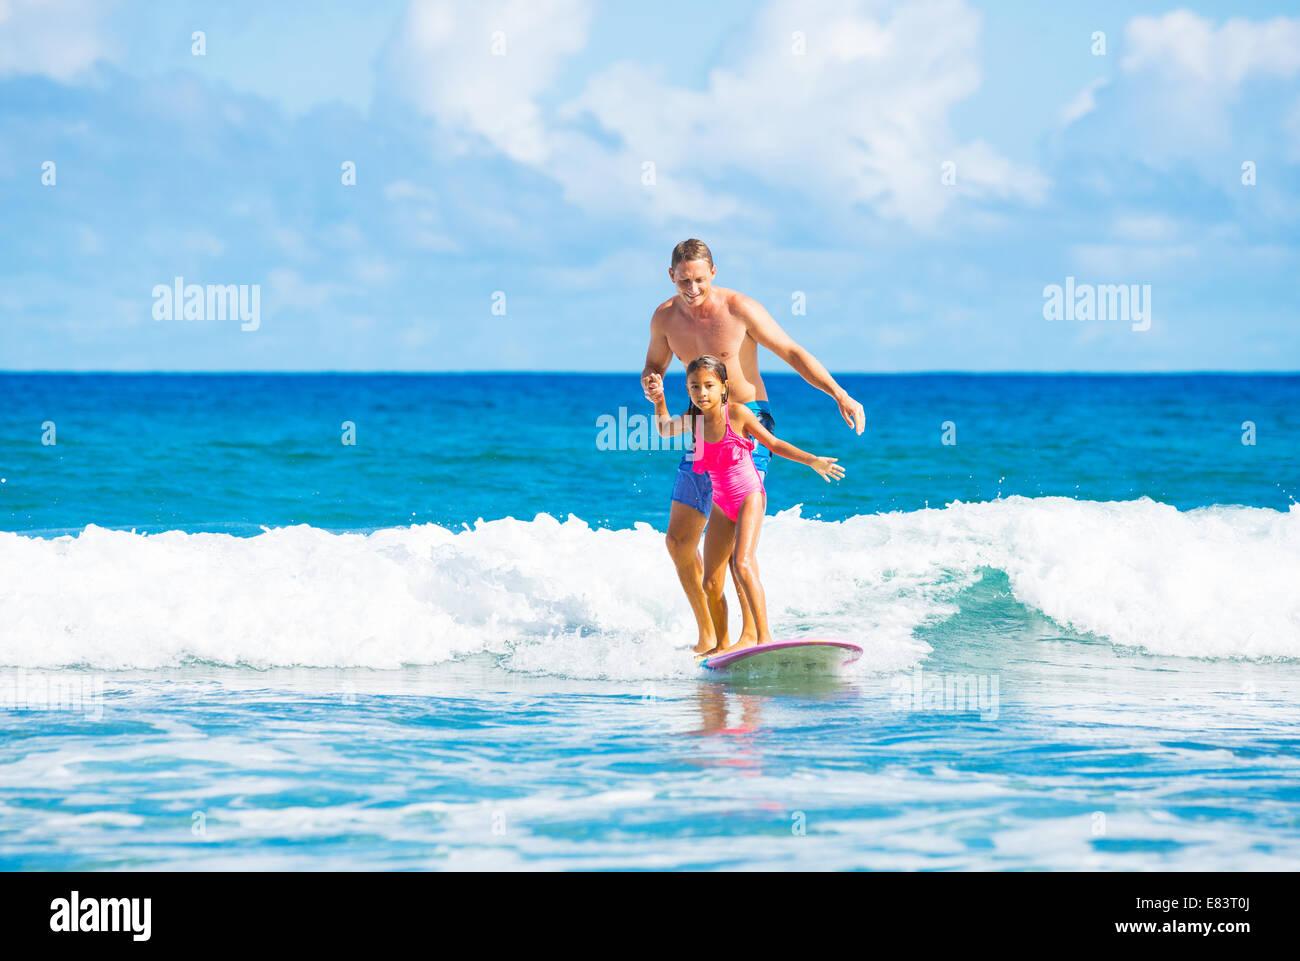 Padre e hija Surfear cogiendo olas, Verano Concepto de familia en el estilo de vida Imagen De Stock